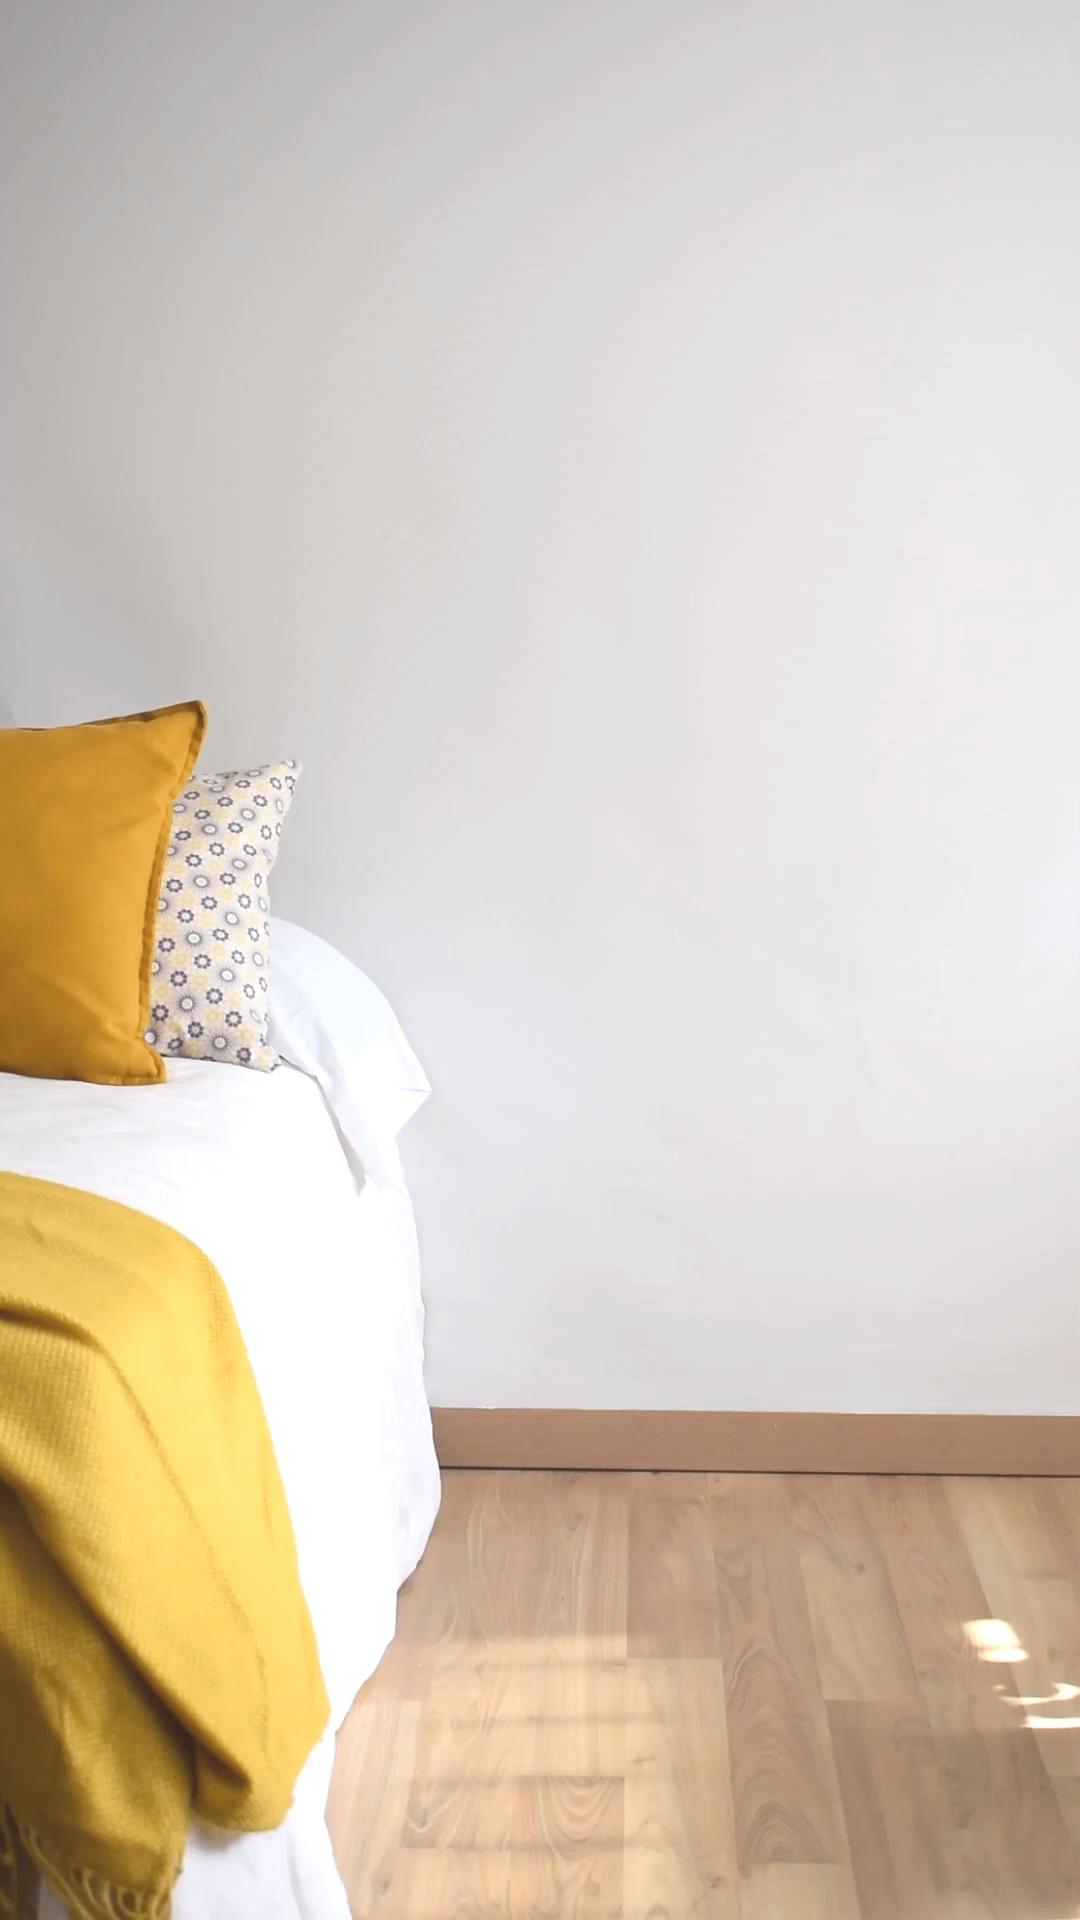 Mesita de noche para un dormitorio de estilo nórdi